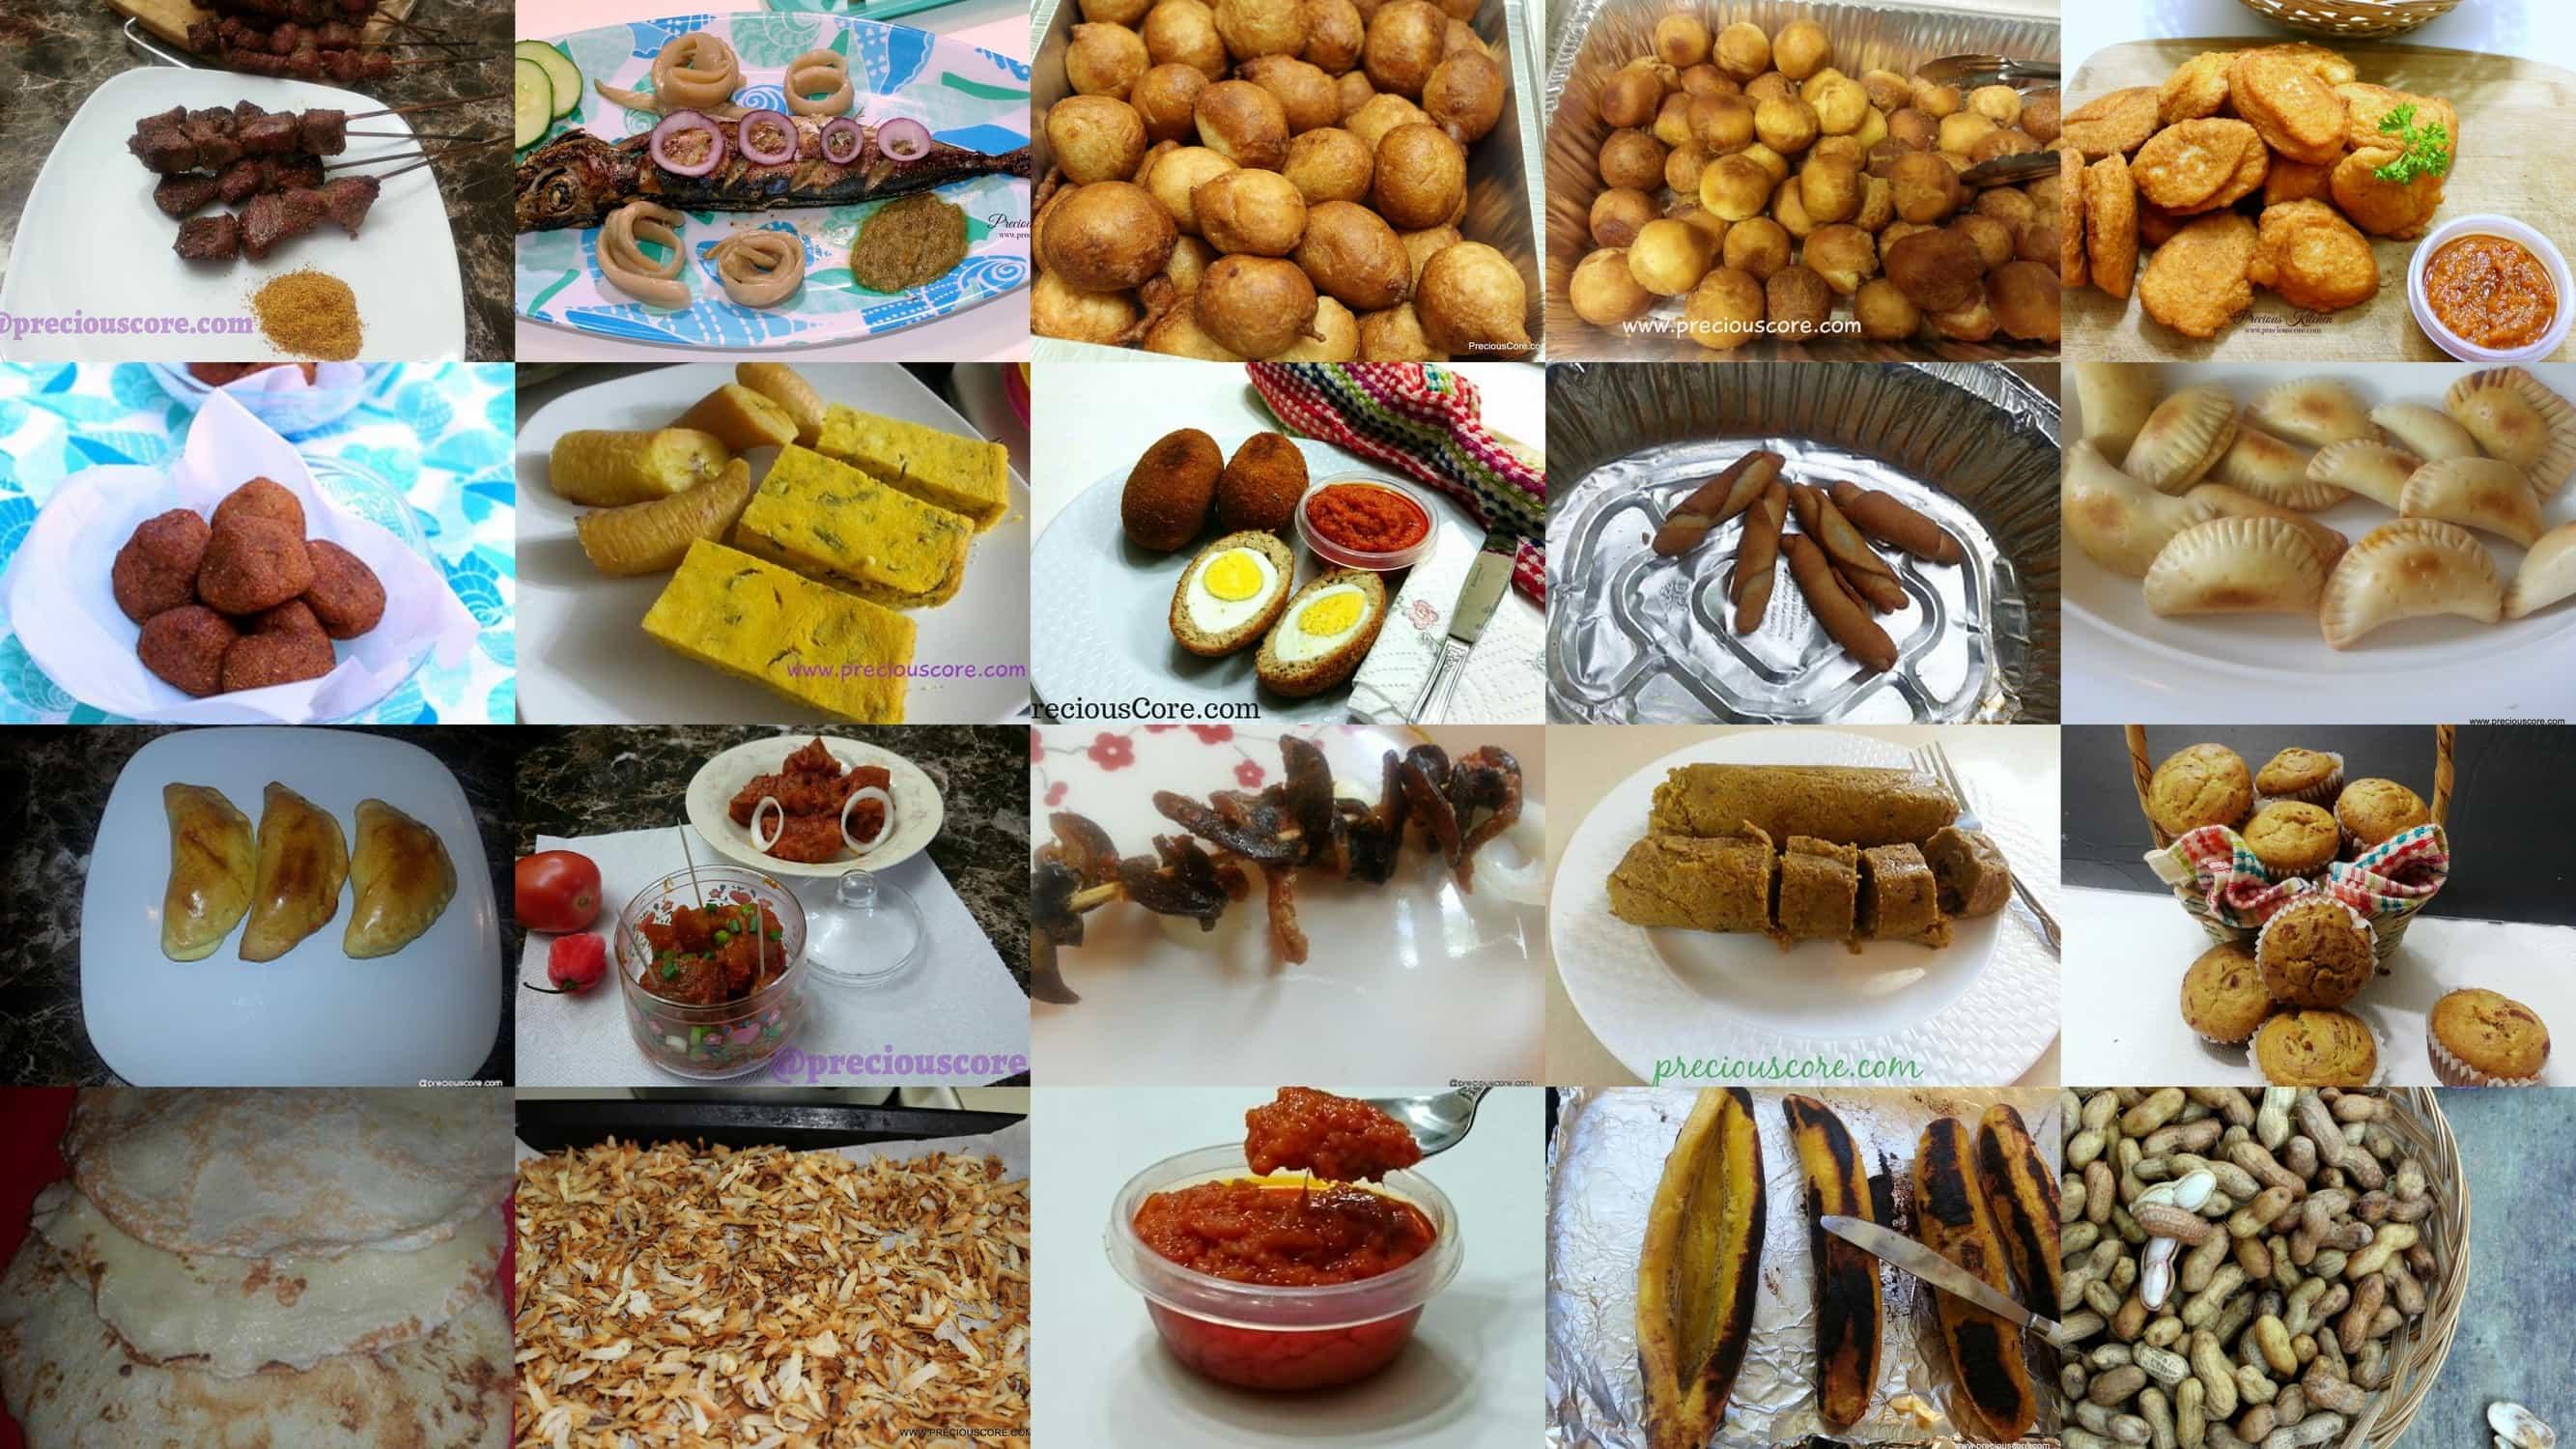 Cameroonian street food